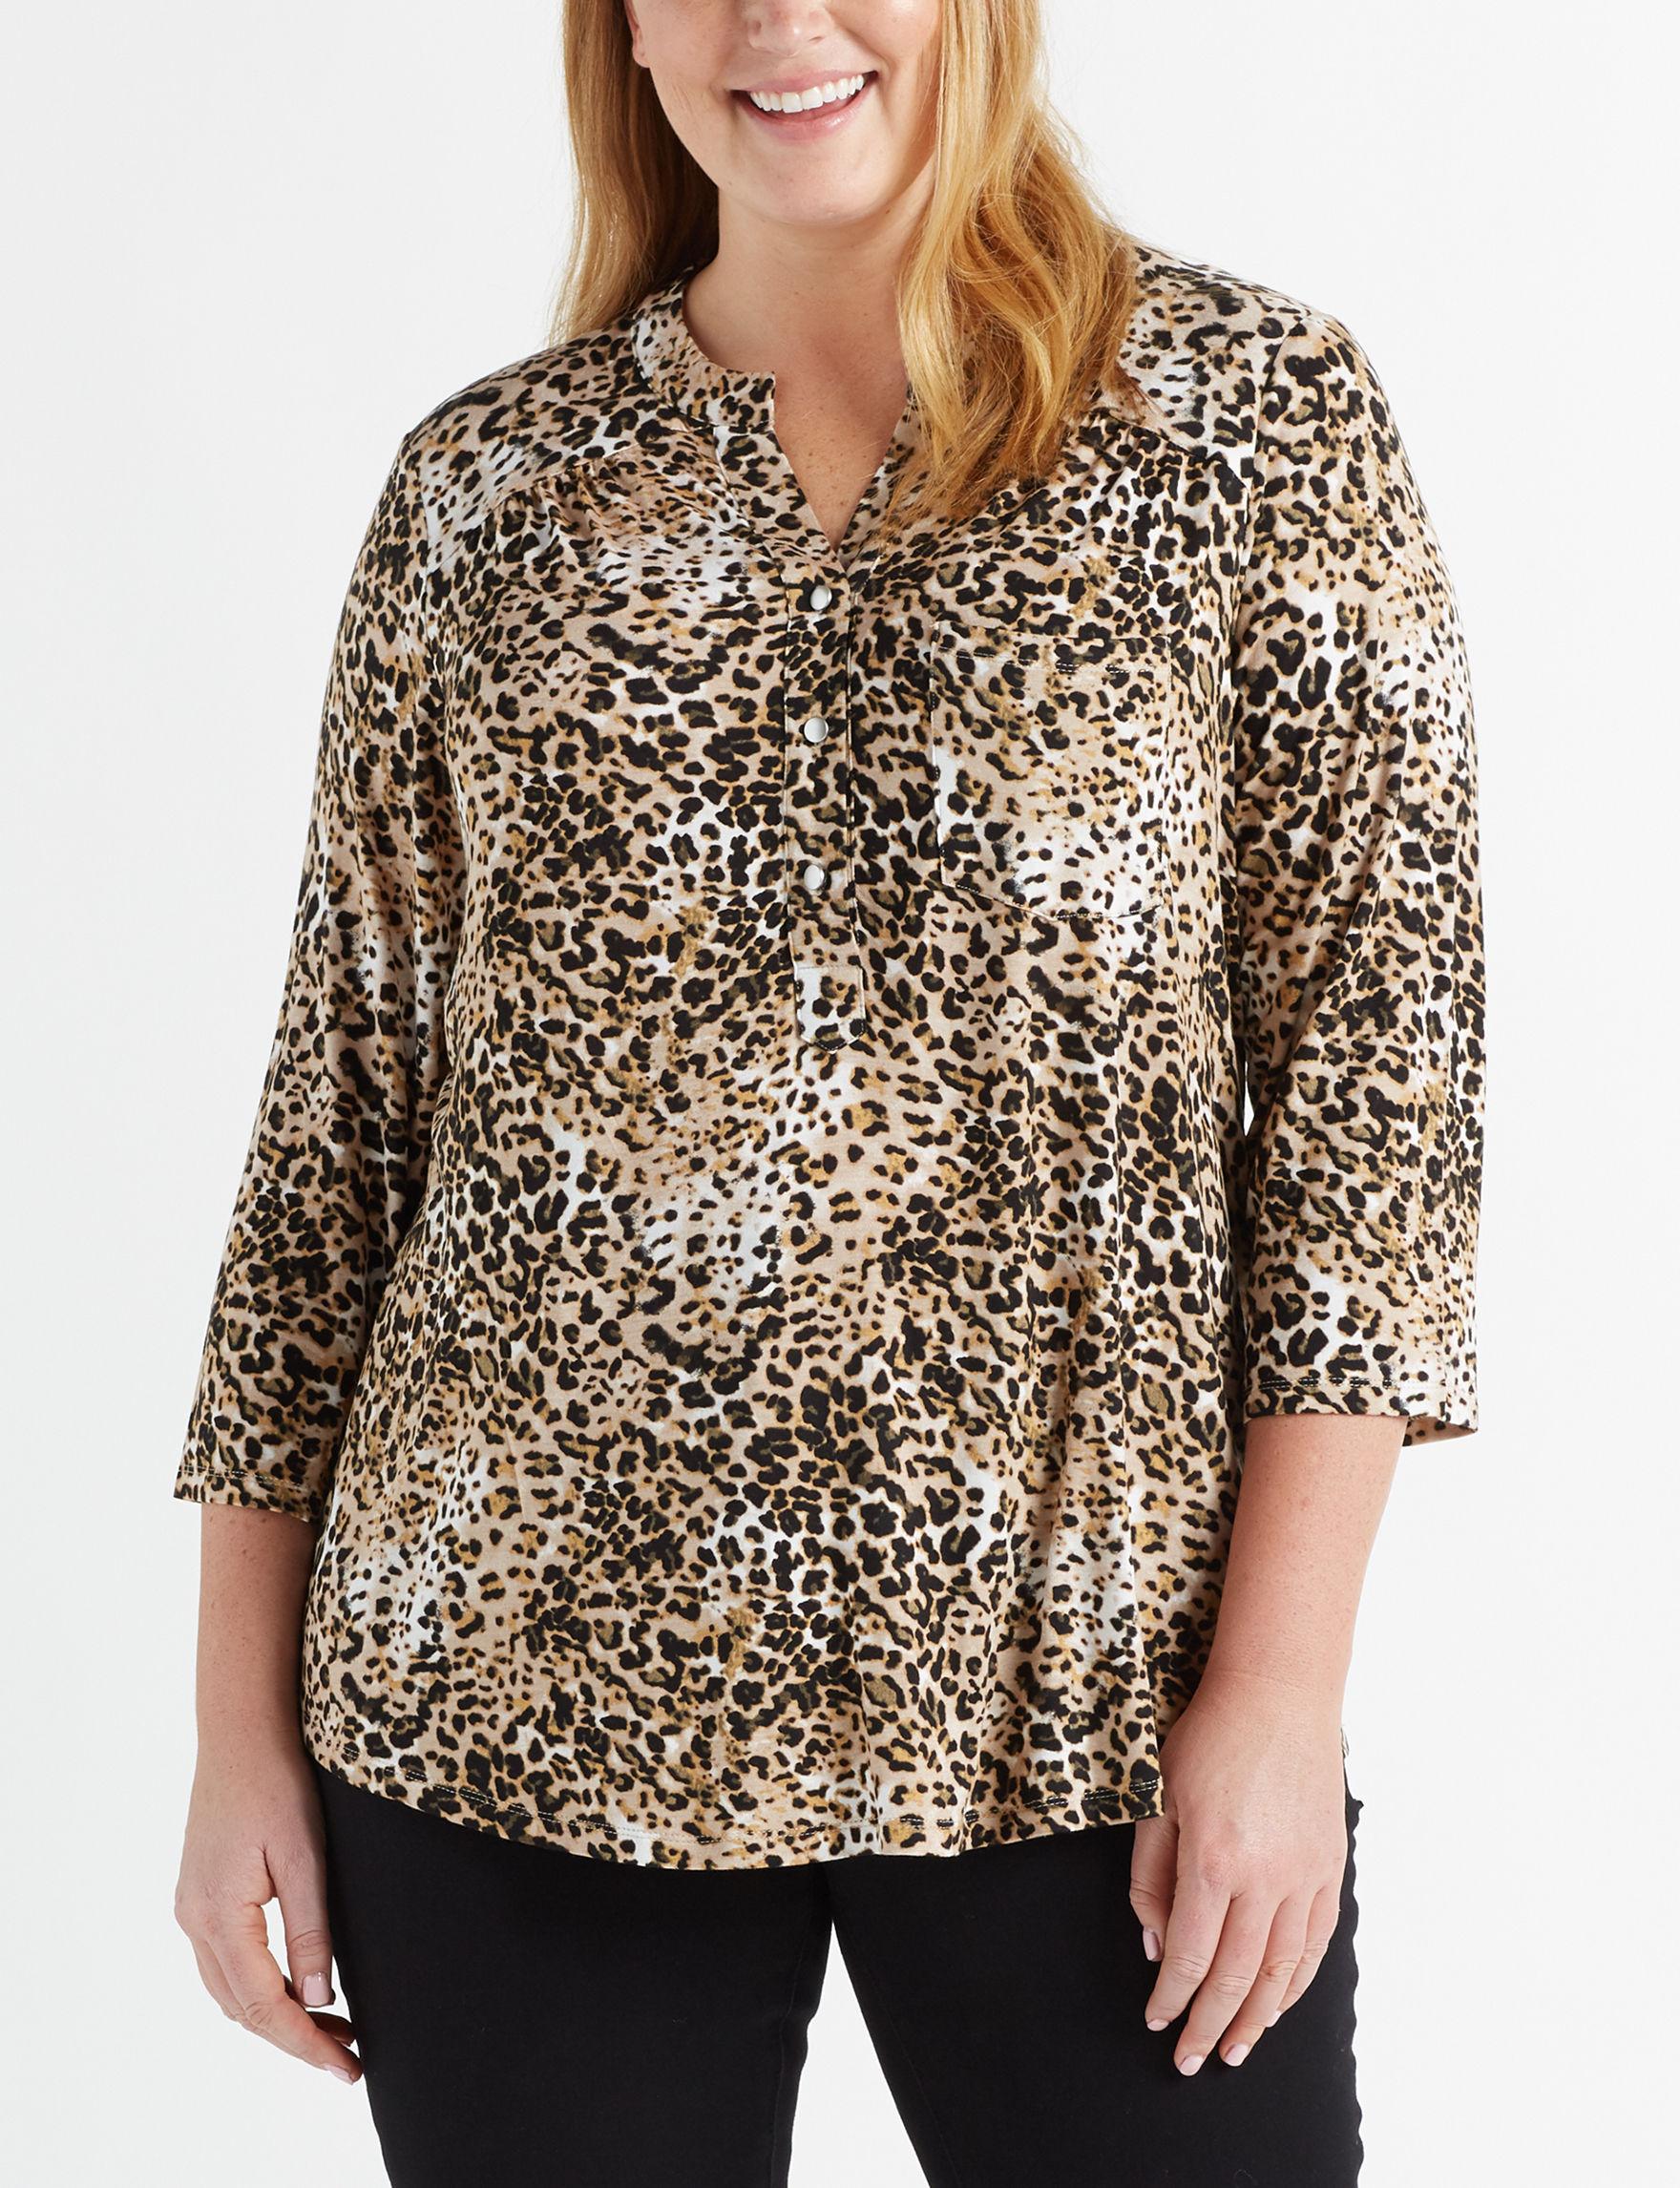 LA Threads Animal Print Casual Button Down Shirts Shirts & Blouses